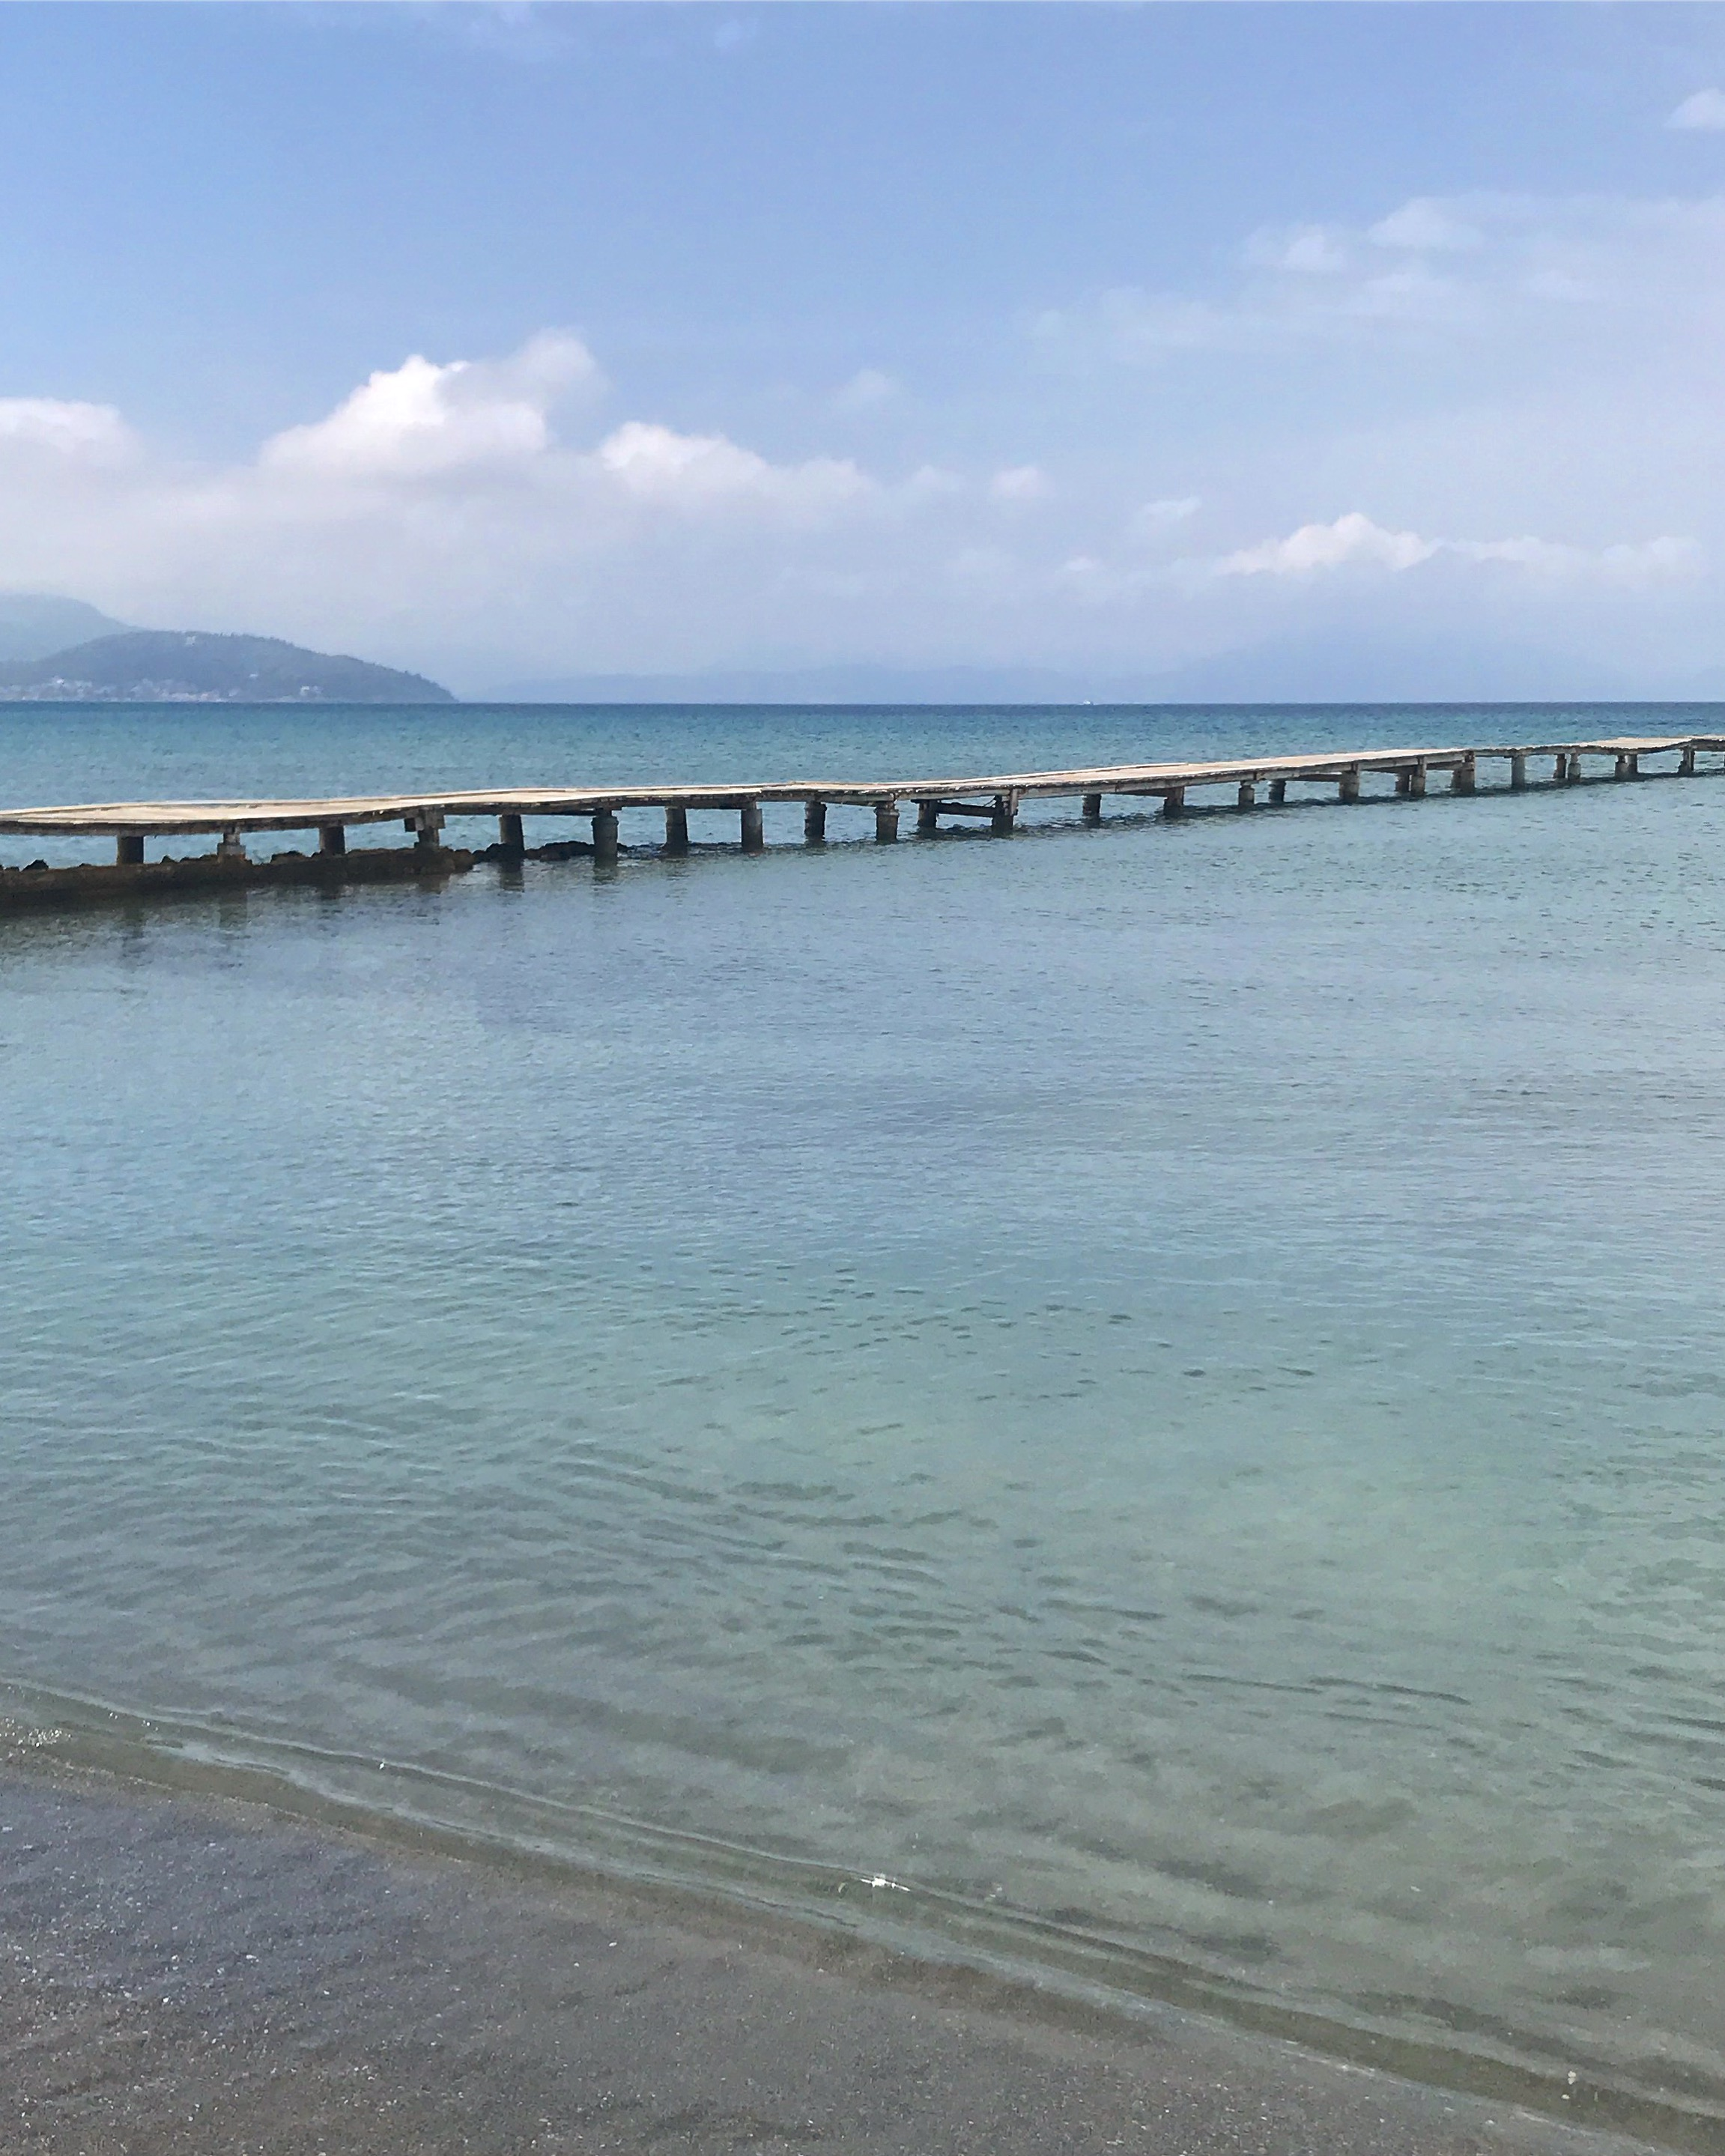 Lefkimmi, Corfu